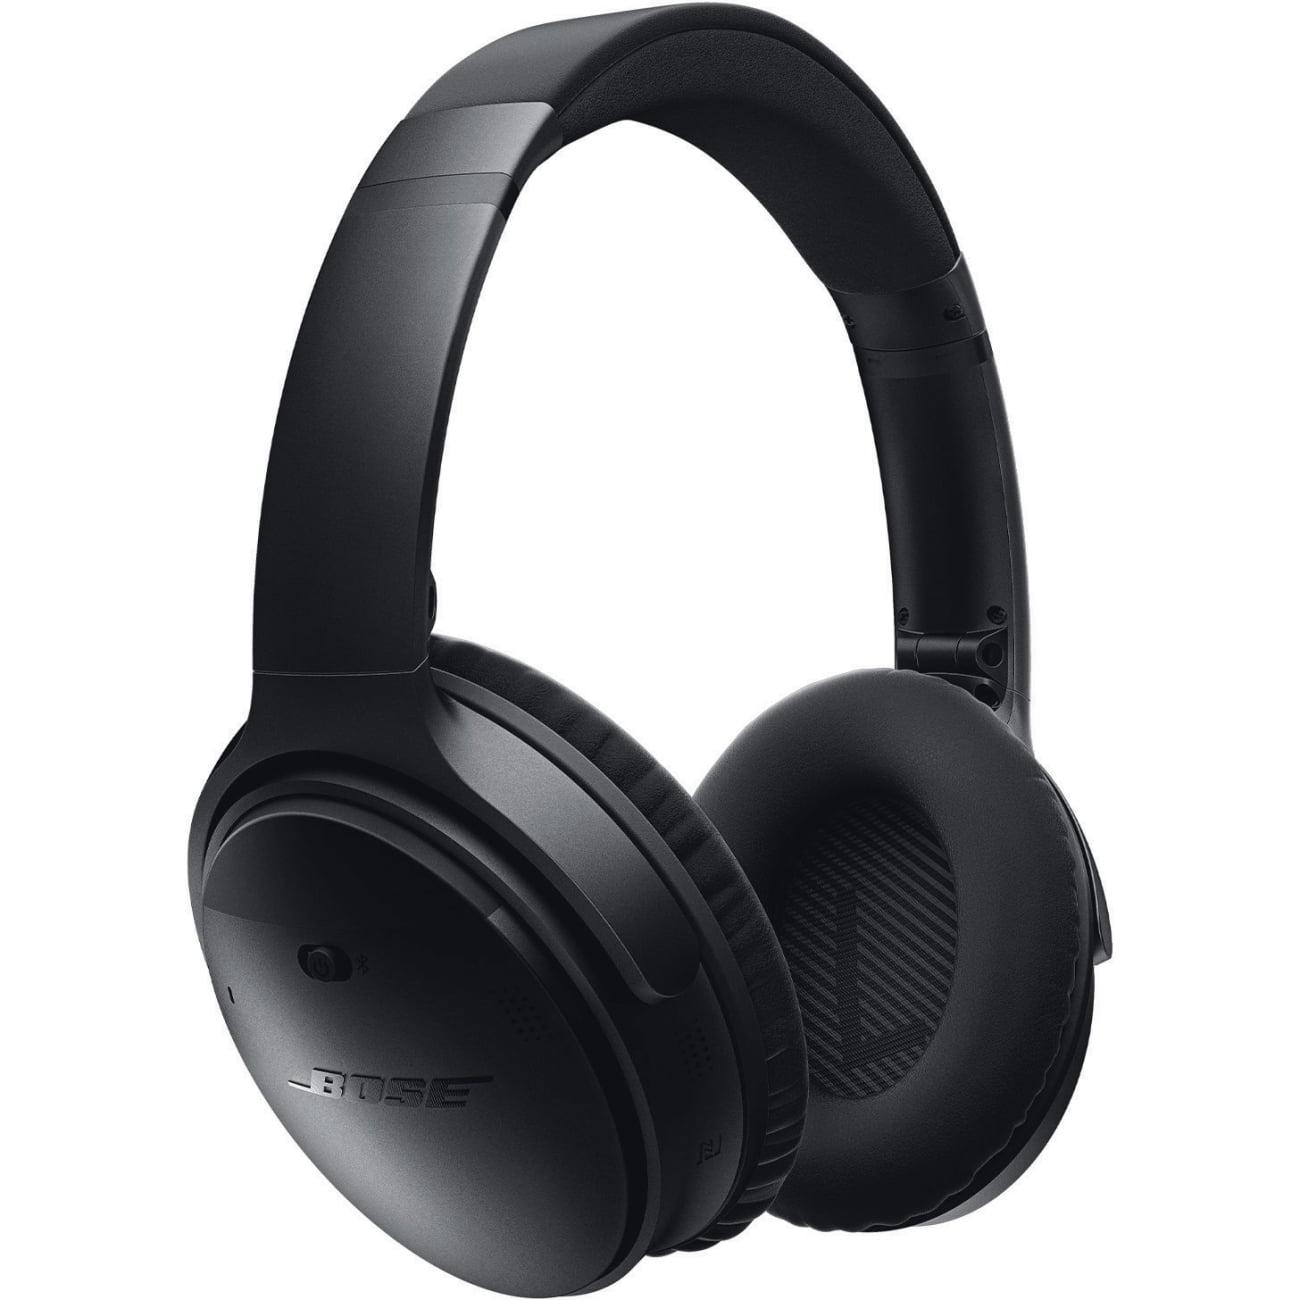 Bose QuietComfort 35 Wireless Headphones Black by Bose